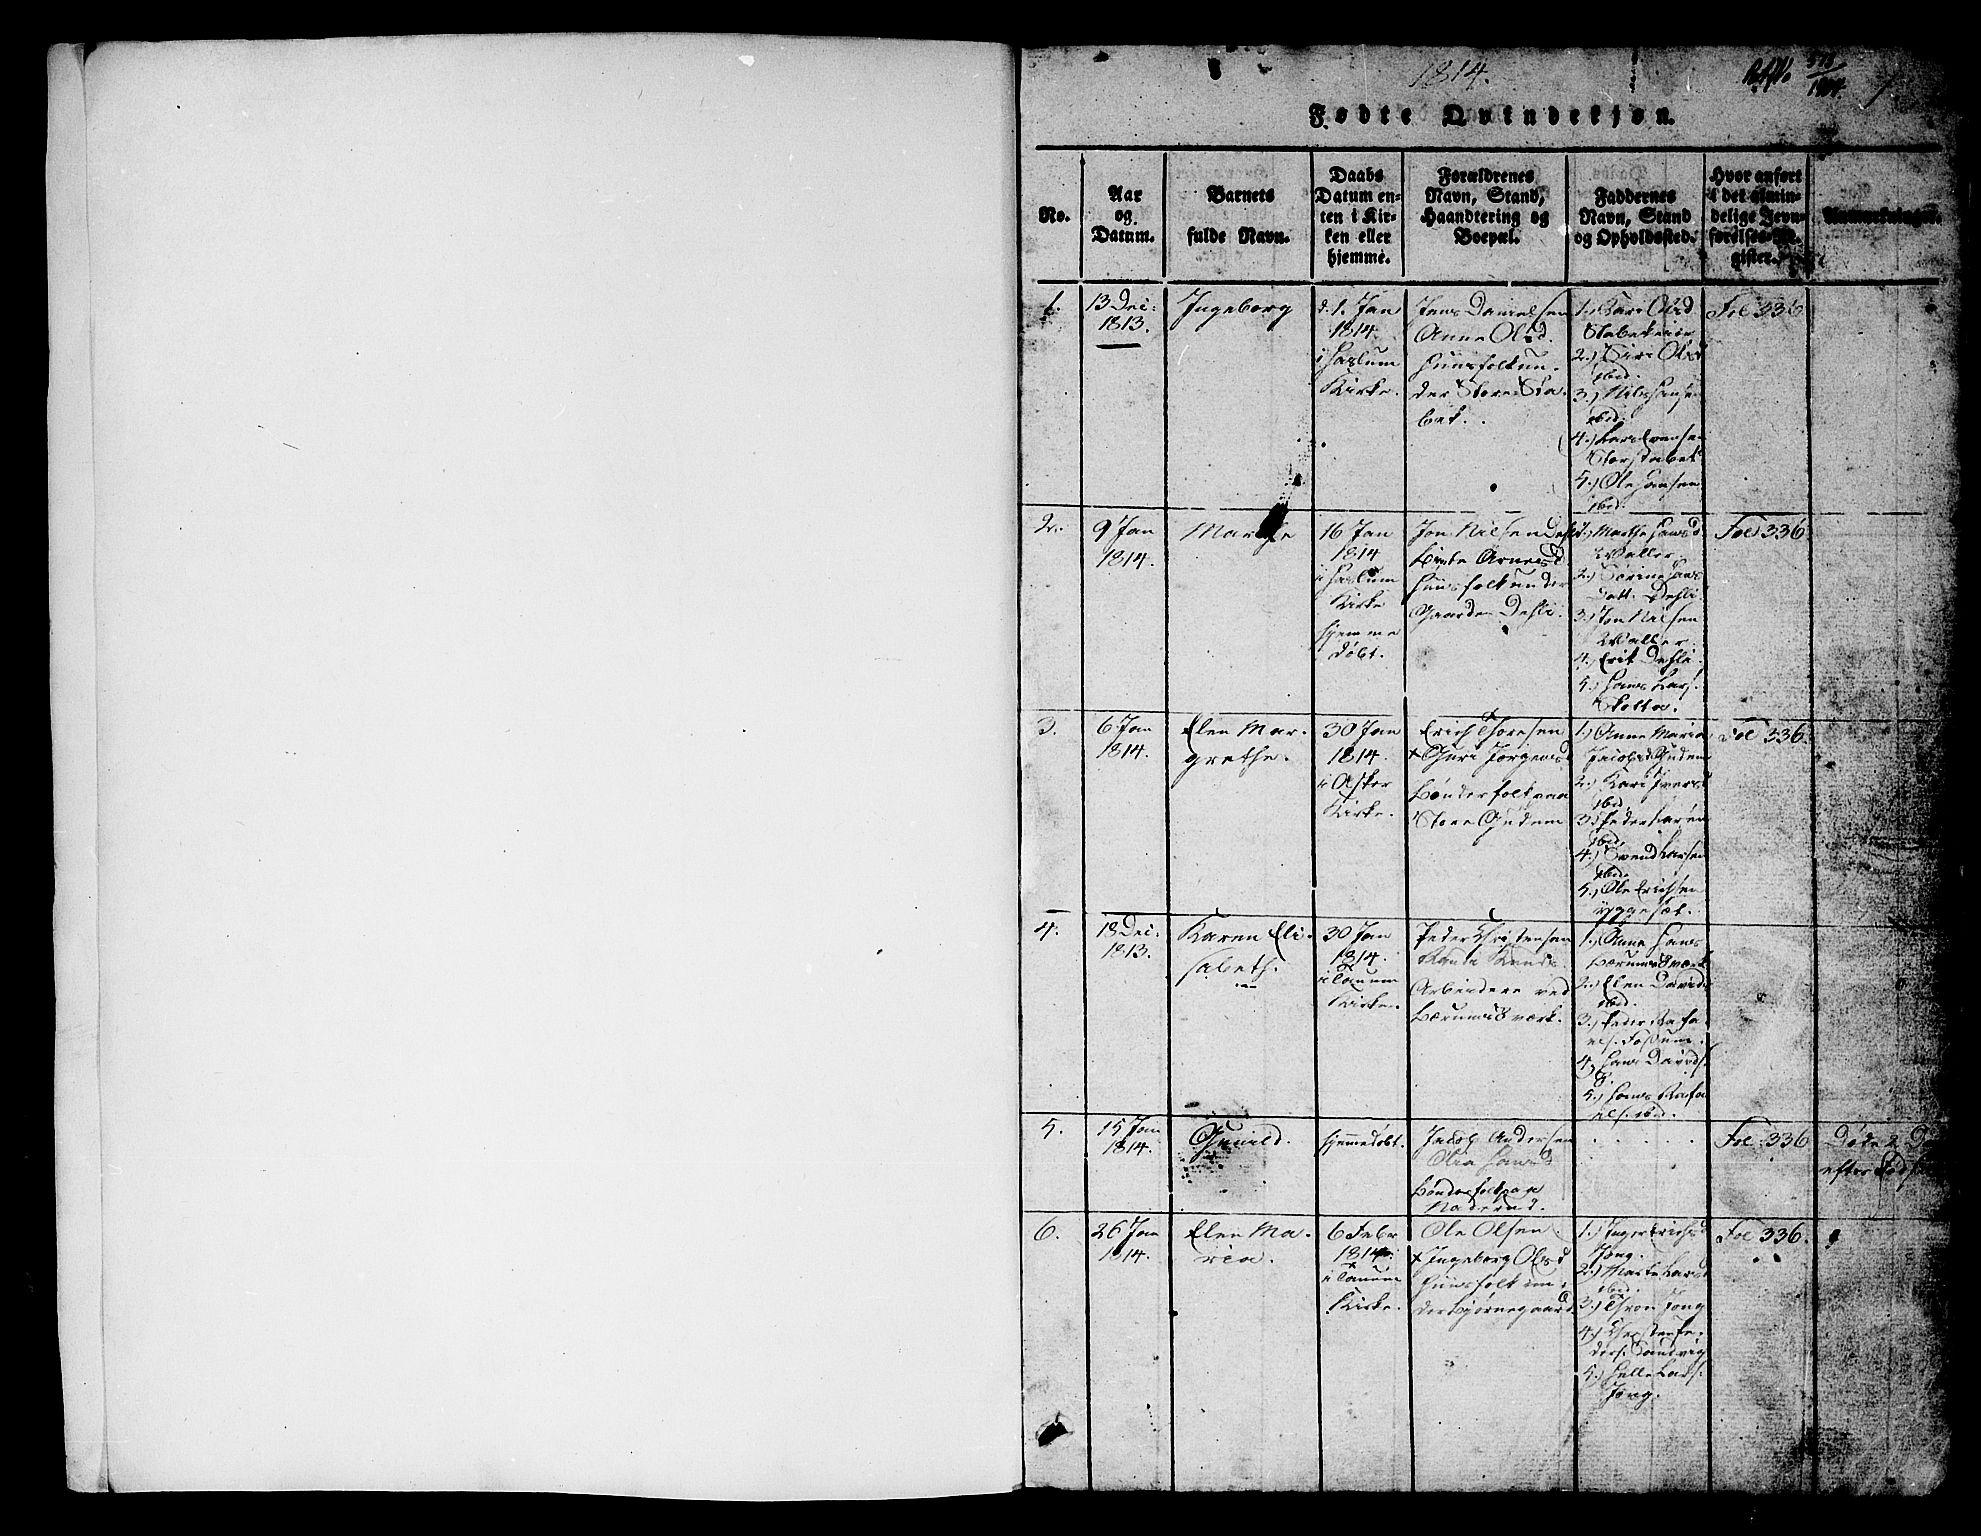 SAO, Asker prestekontor Kirkebøker, G/Ga/L0001: Klokkerbok nr. I 1, 1814-1830, s. 1